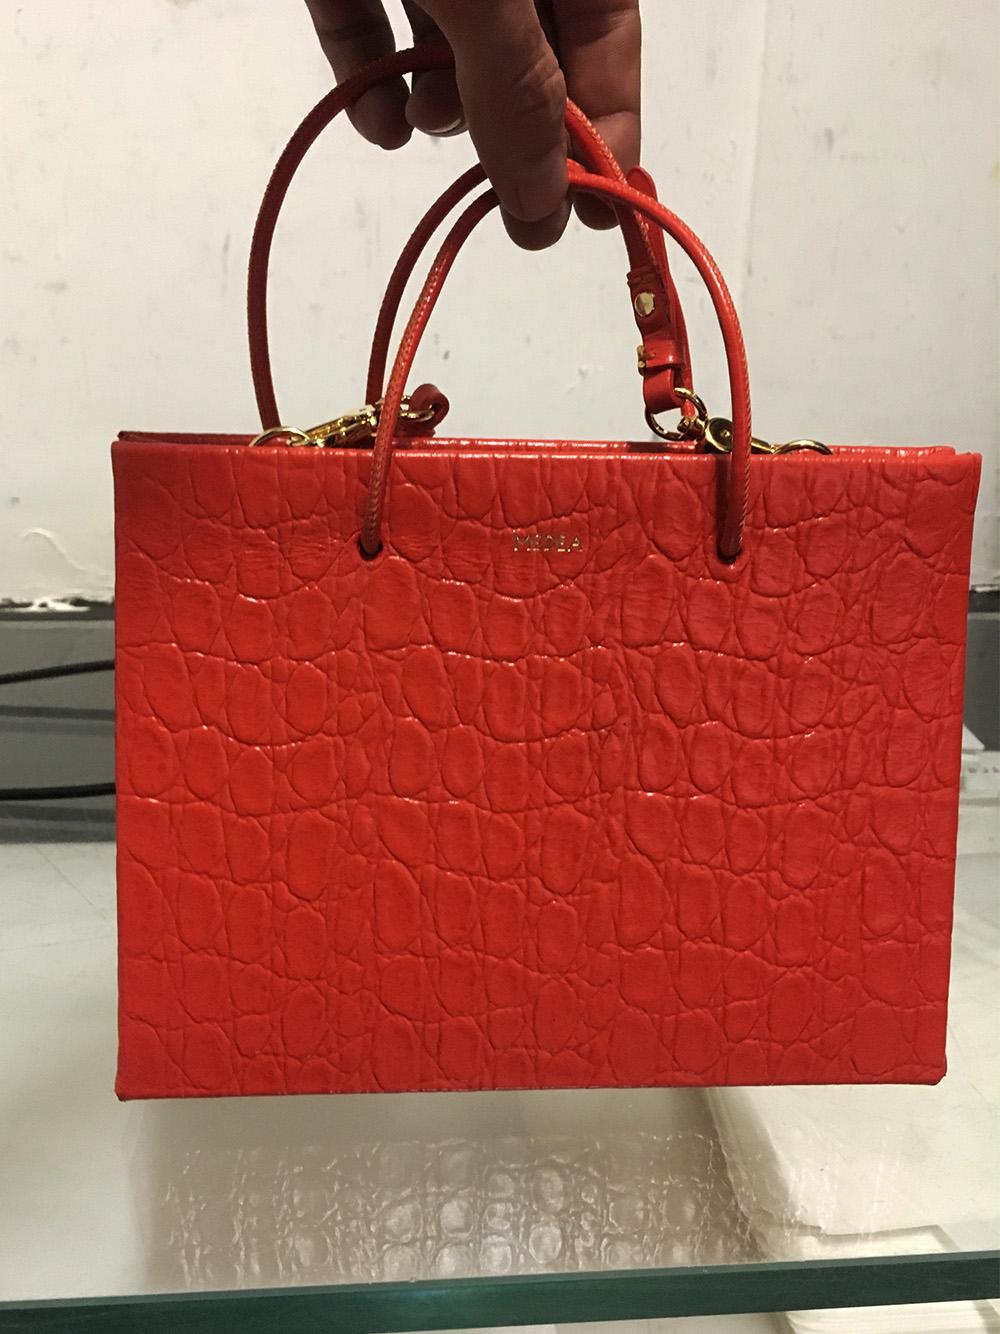 19SMEBO015 RED